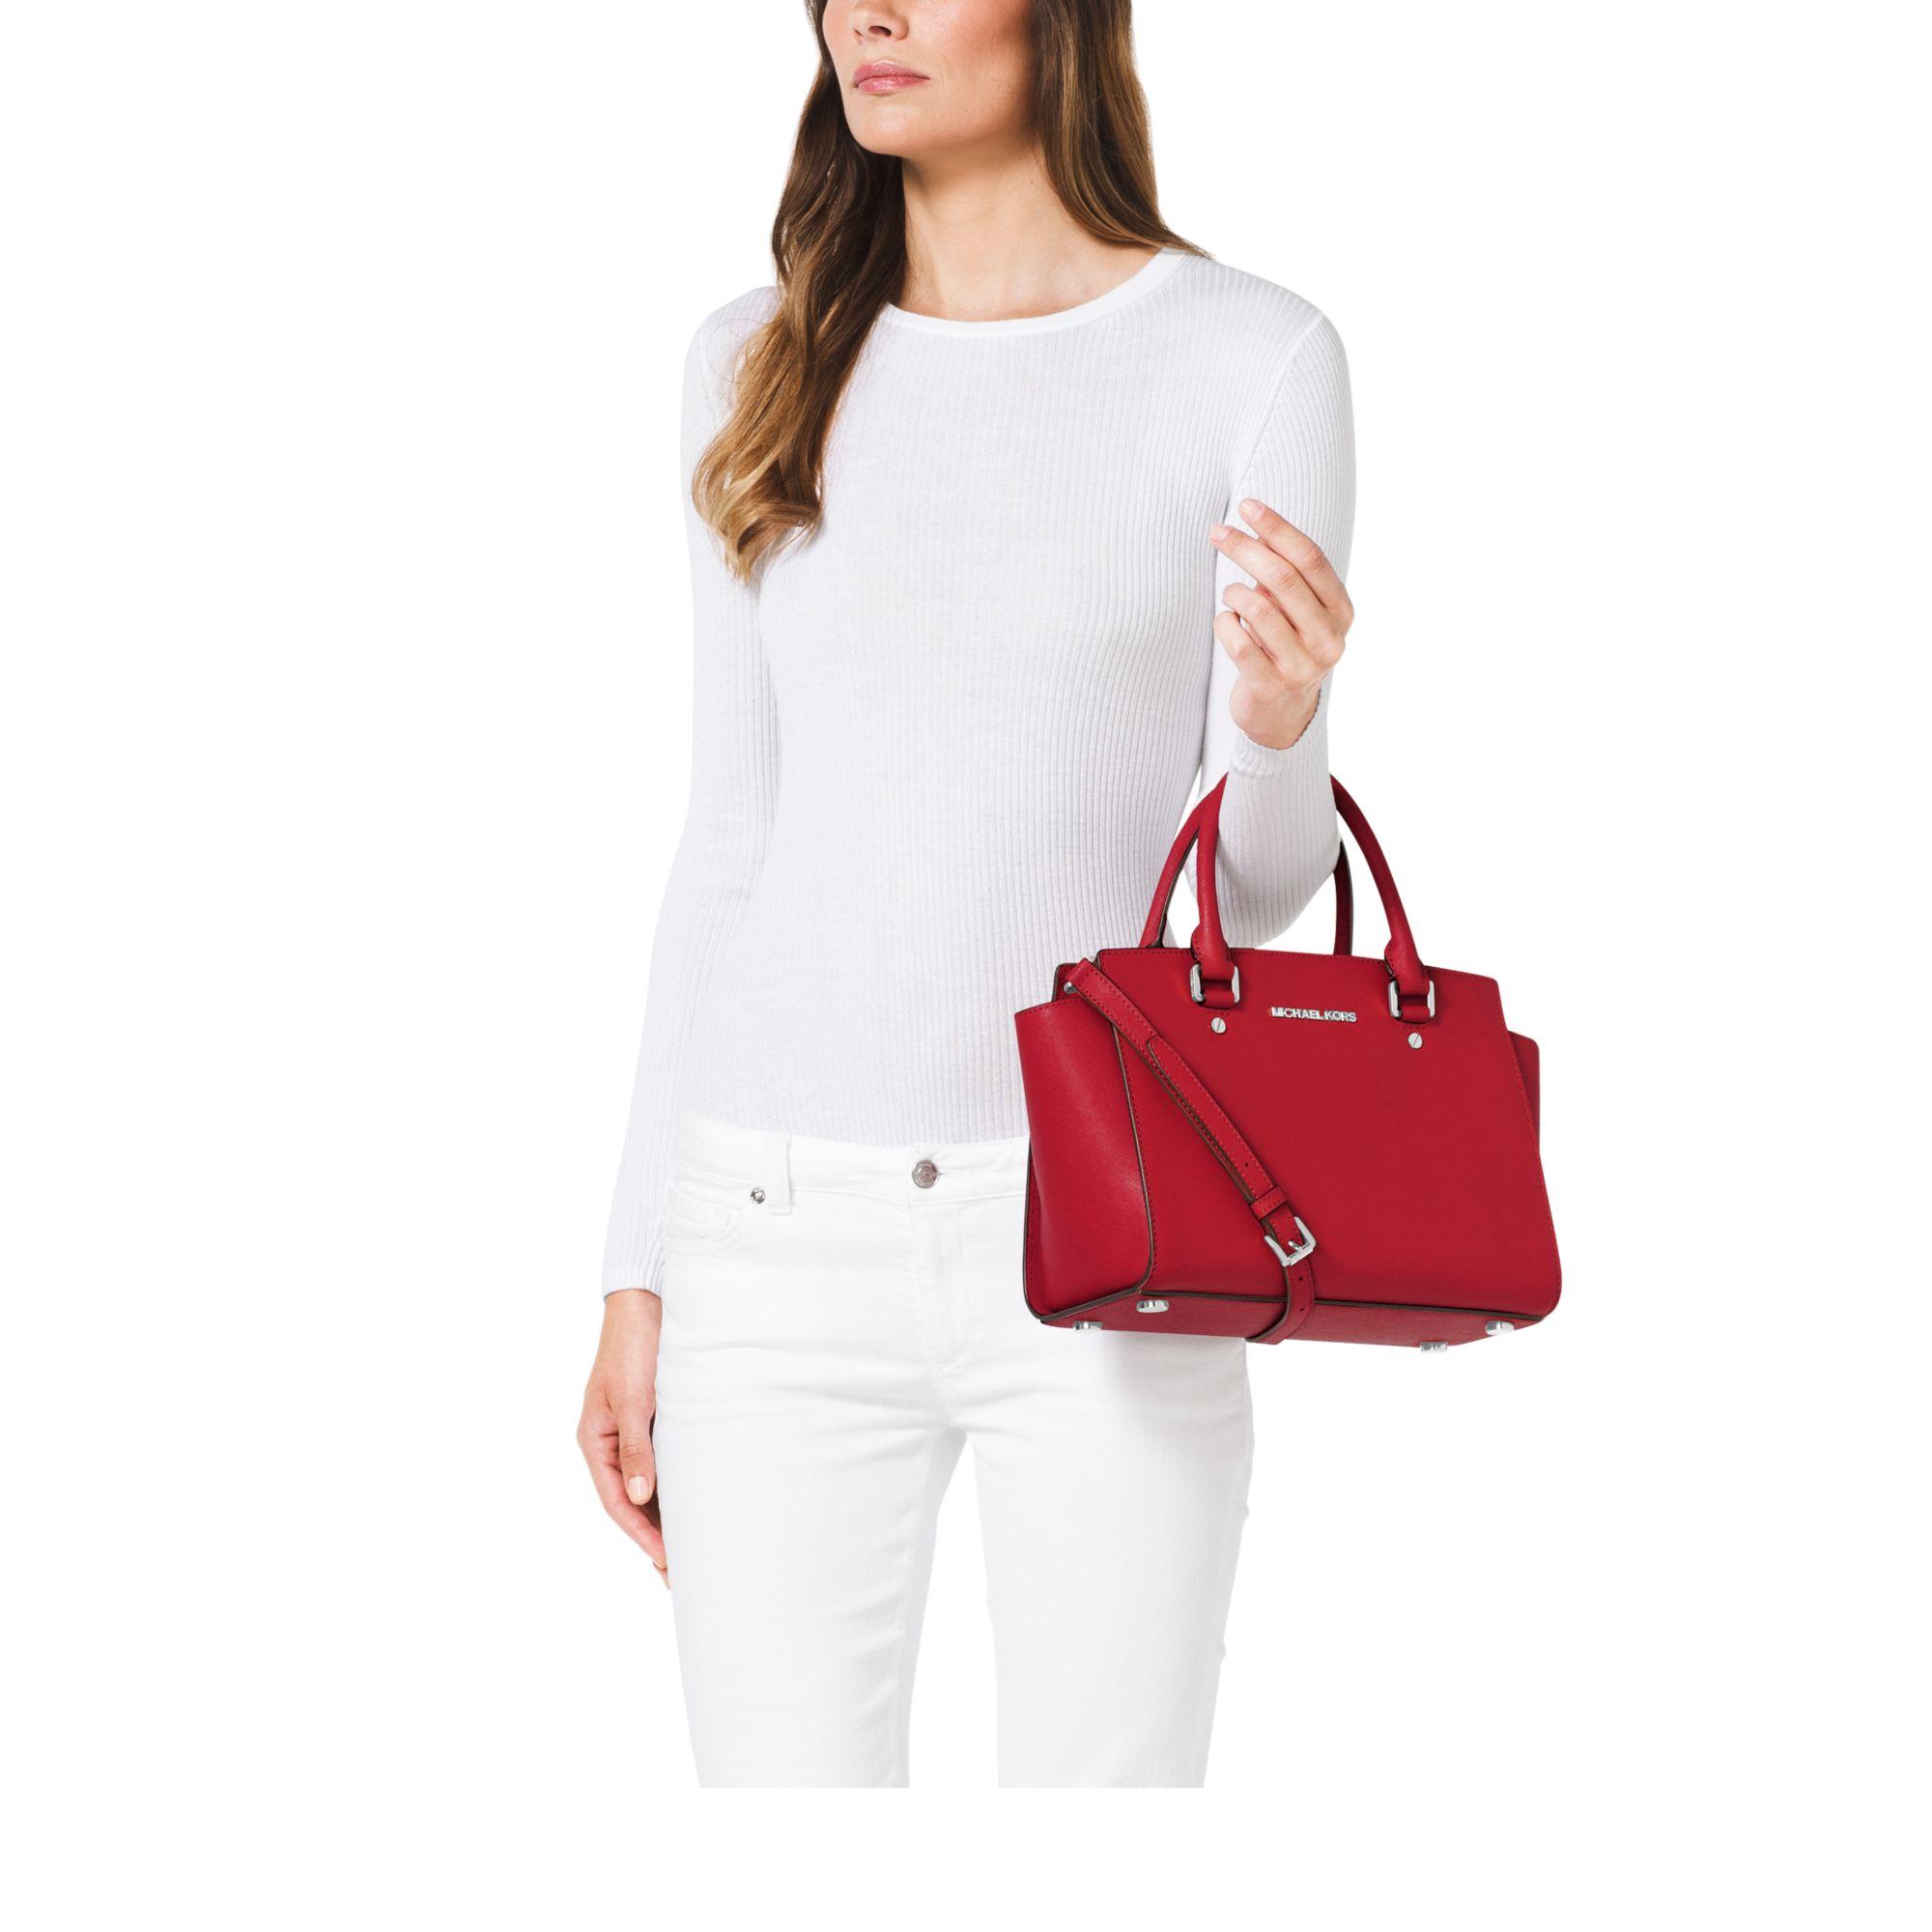 michael kors selma medium saffiano leather satchel in red. Black Bedroom Furniture Sets. Home Design Ideas